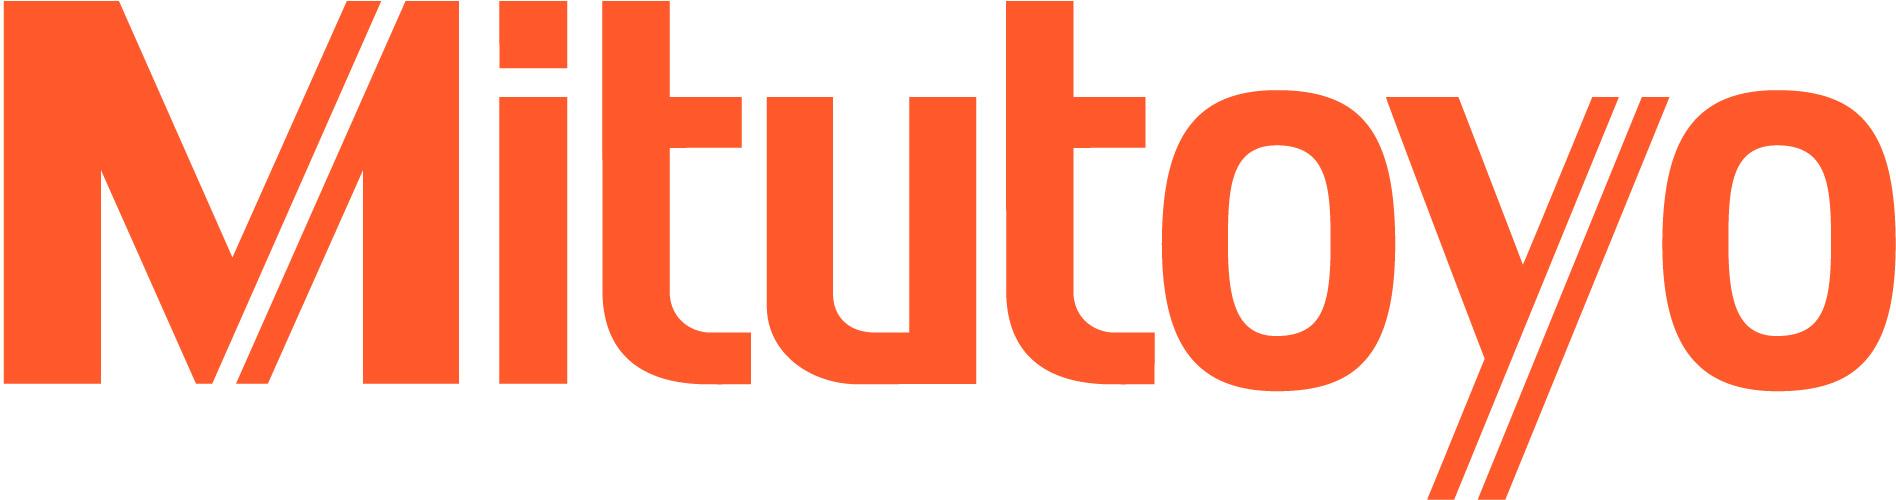 logo - Mitutoyo Emergency